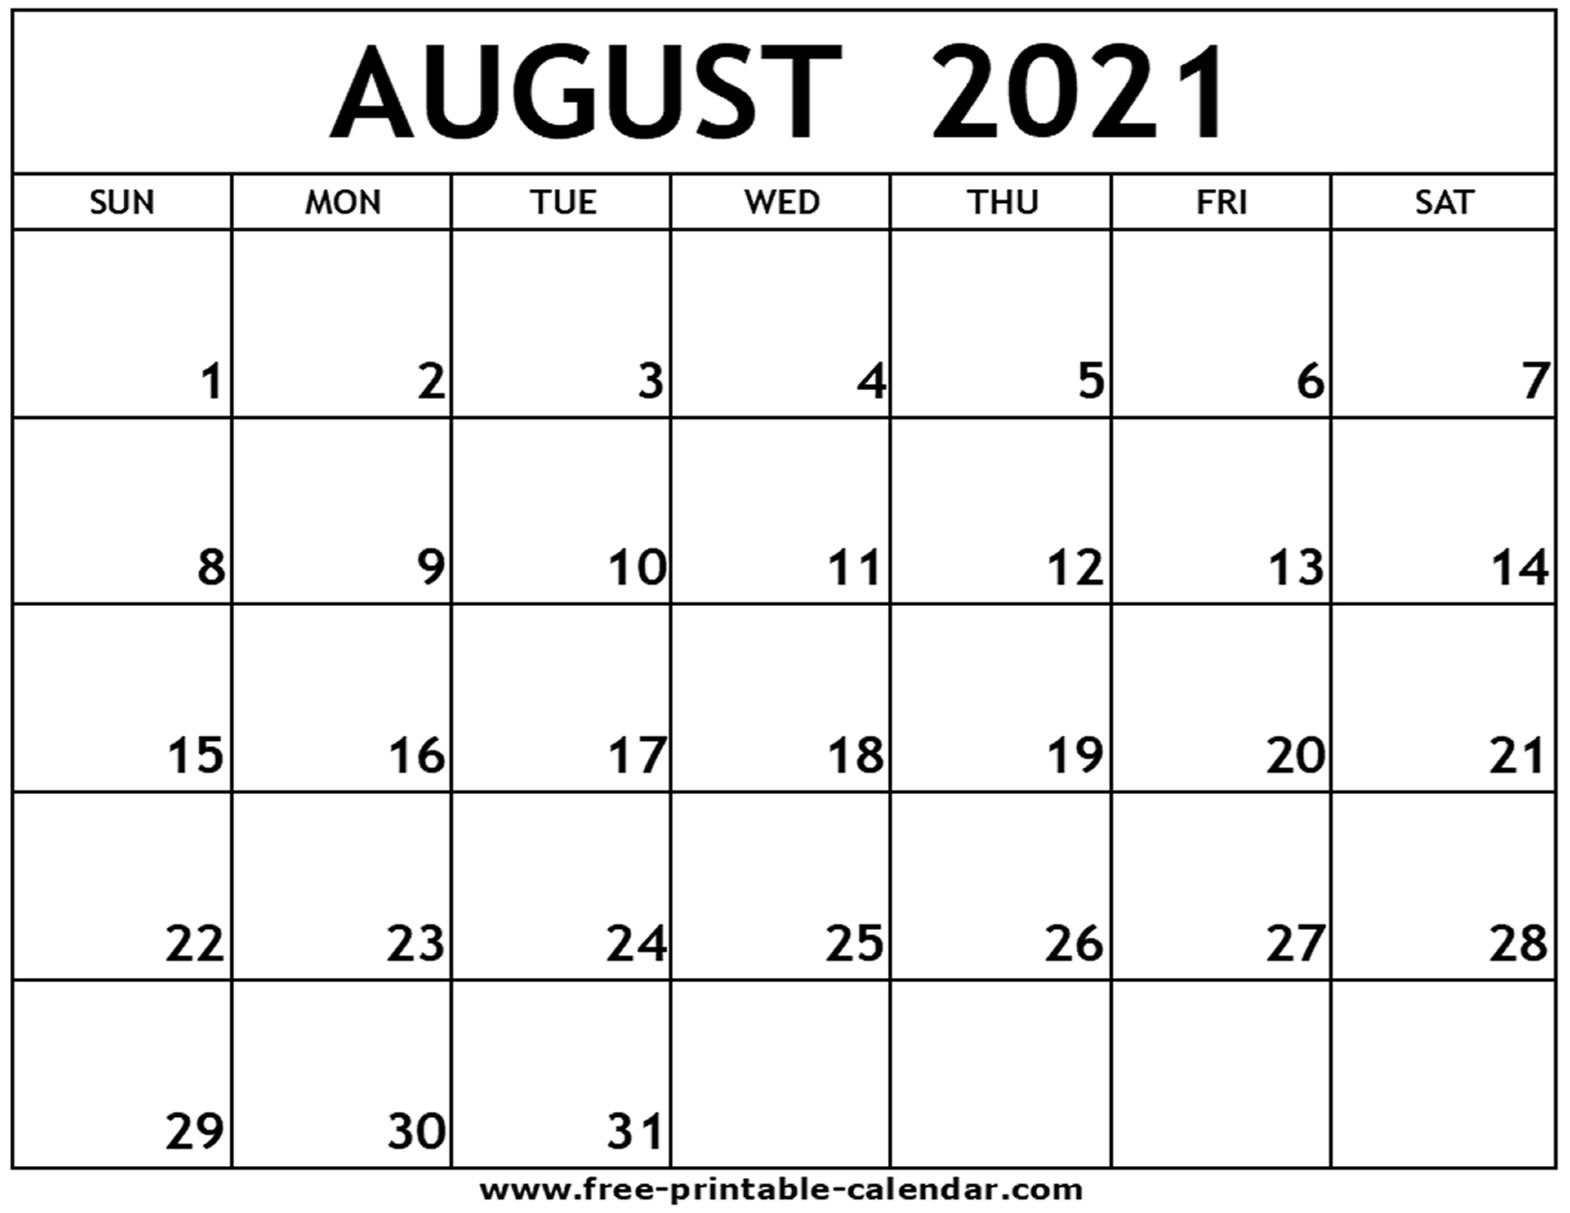 Take Calendar August 2021 Printable